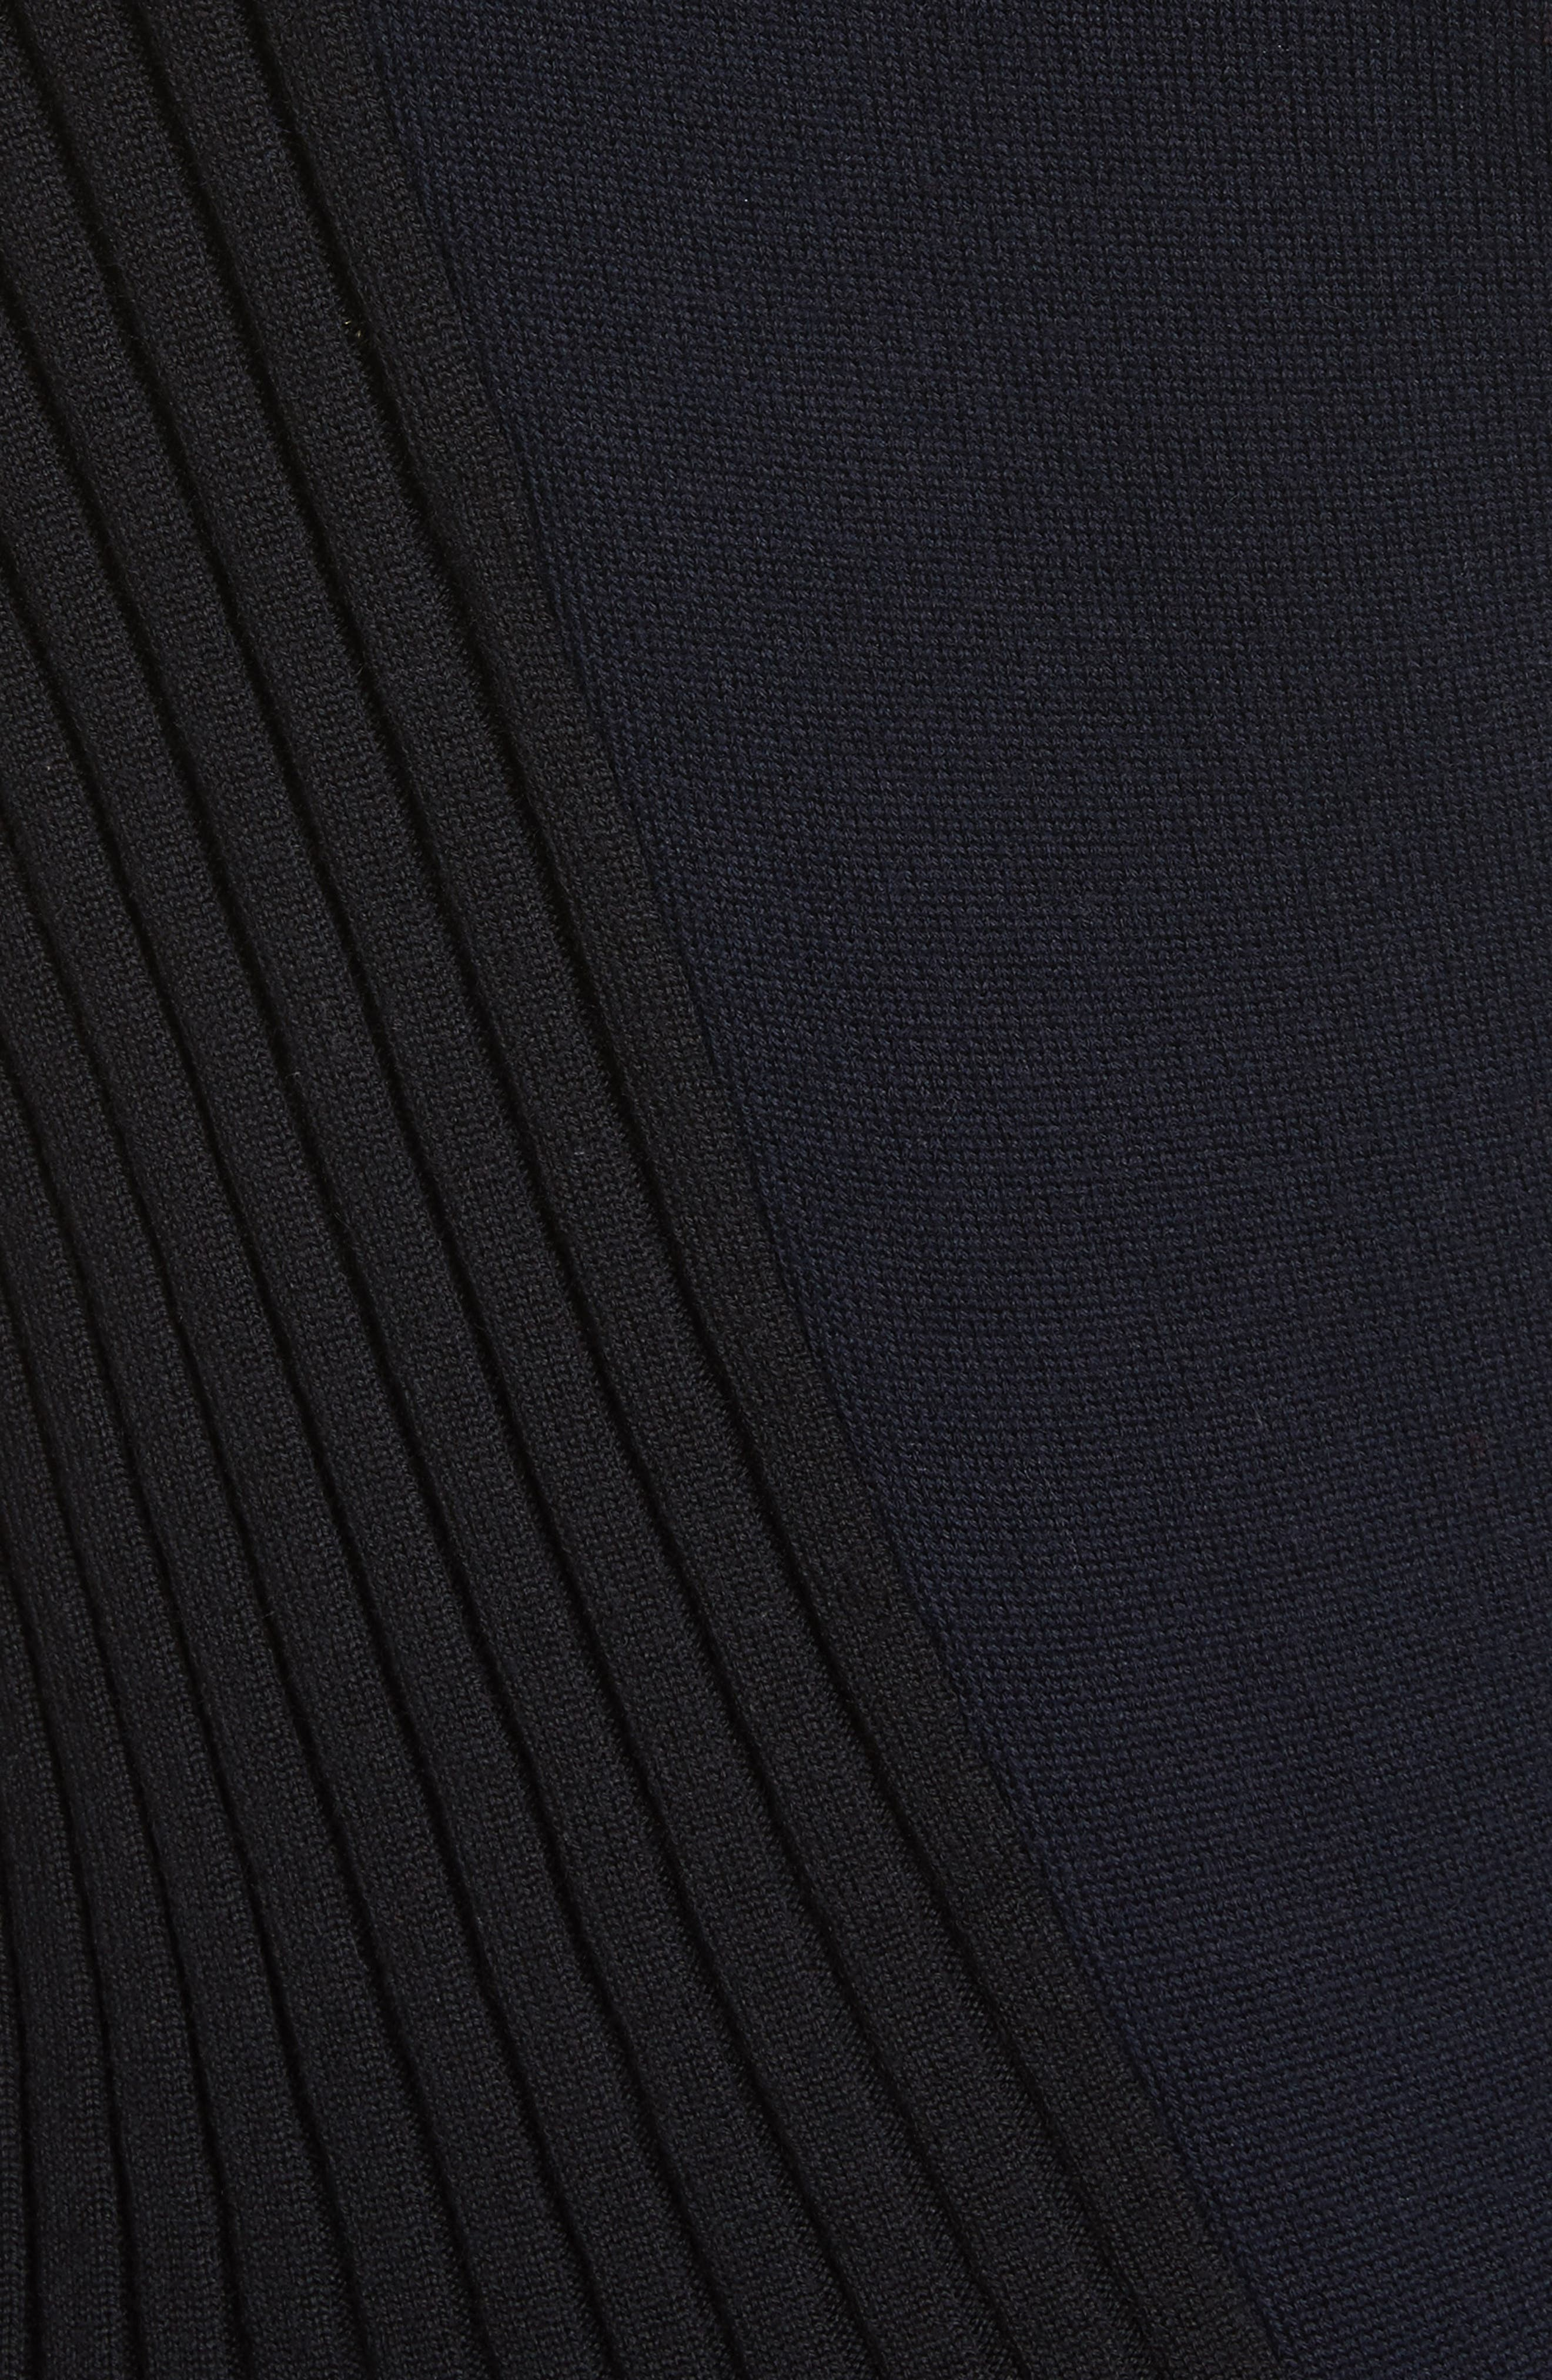 Asymmetrical Button Front Turtleneck Sweater,                             Alternate thumbnail 5, color,                             400